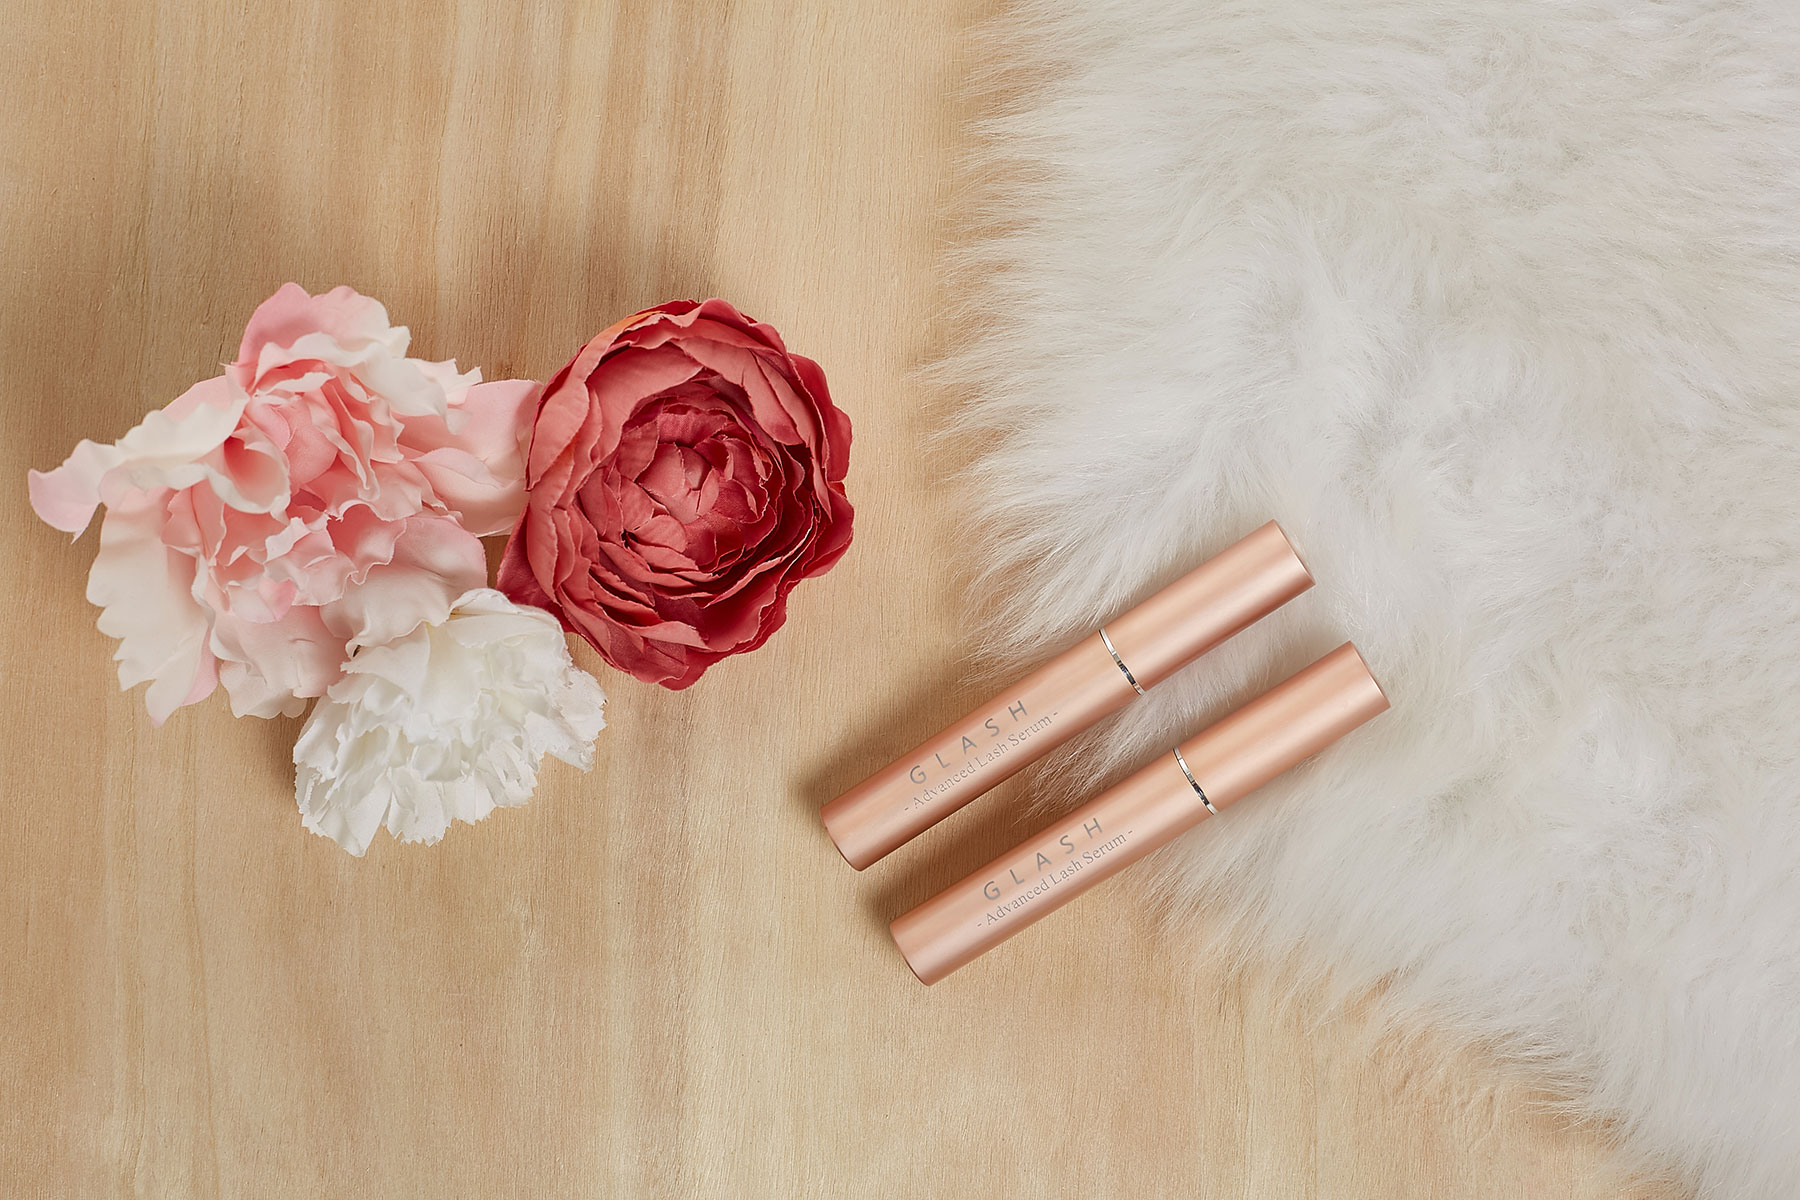 Makeup-product-styled-marketing-photo